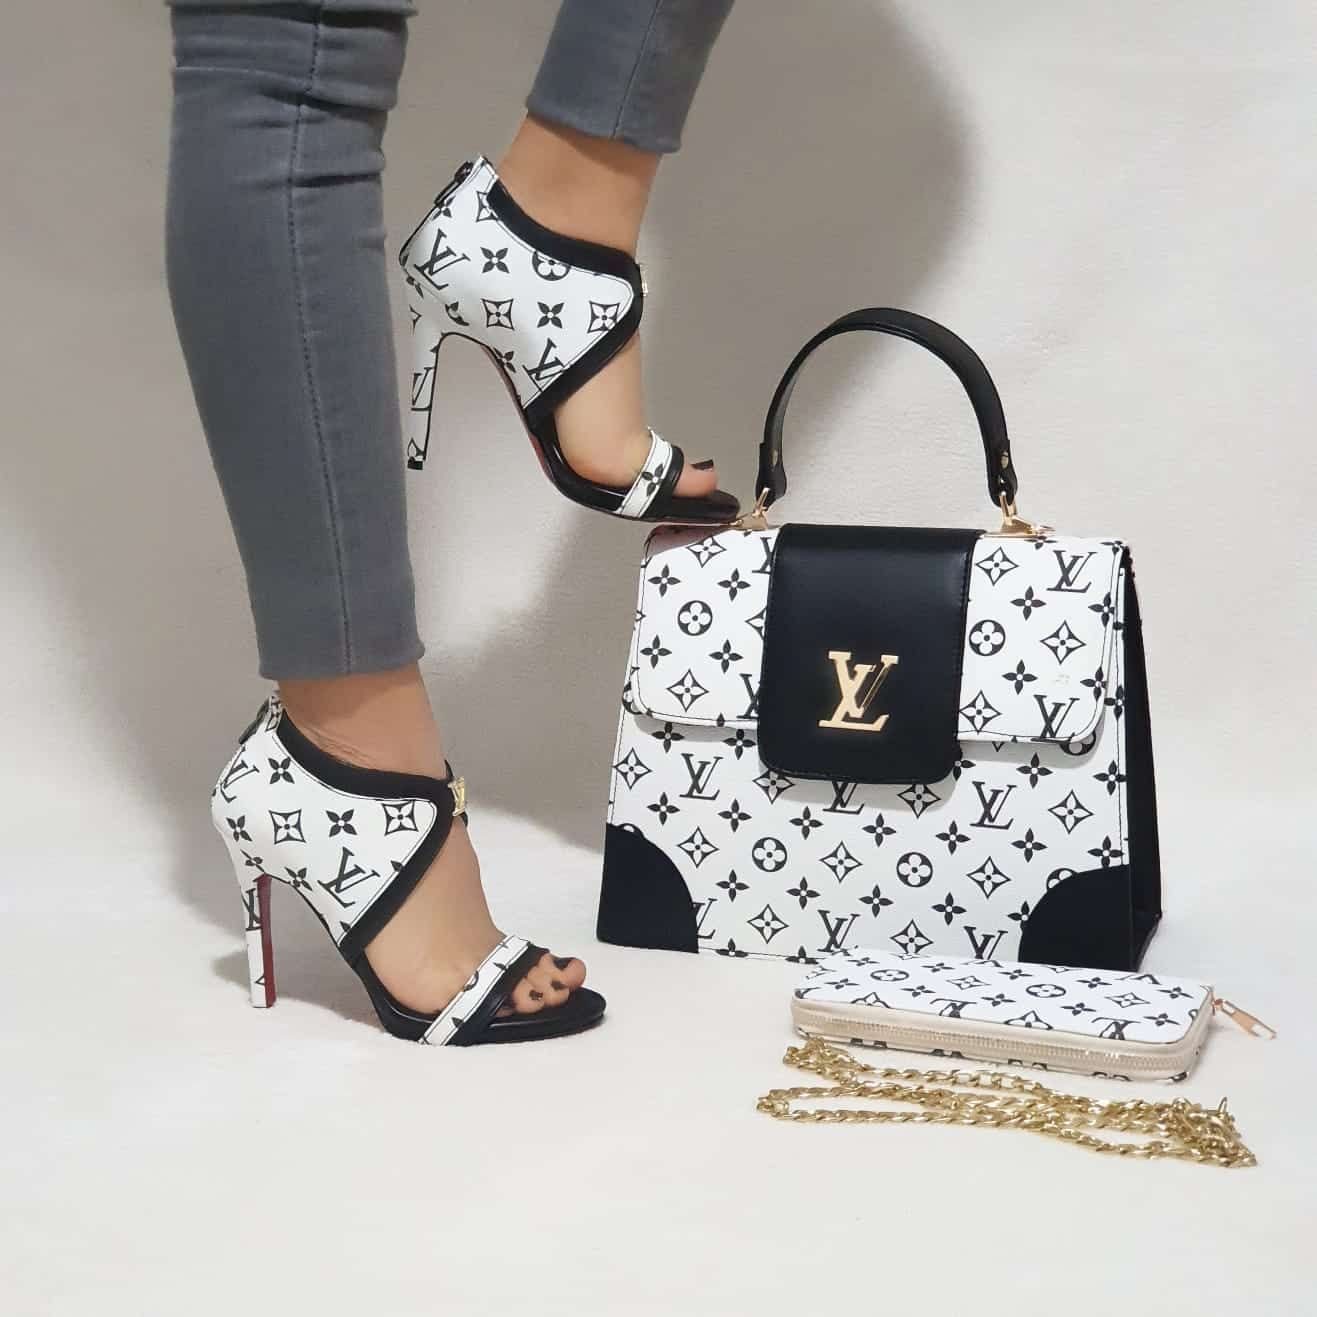 Lv heeled sets